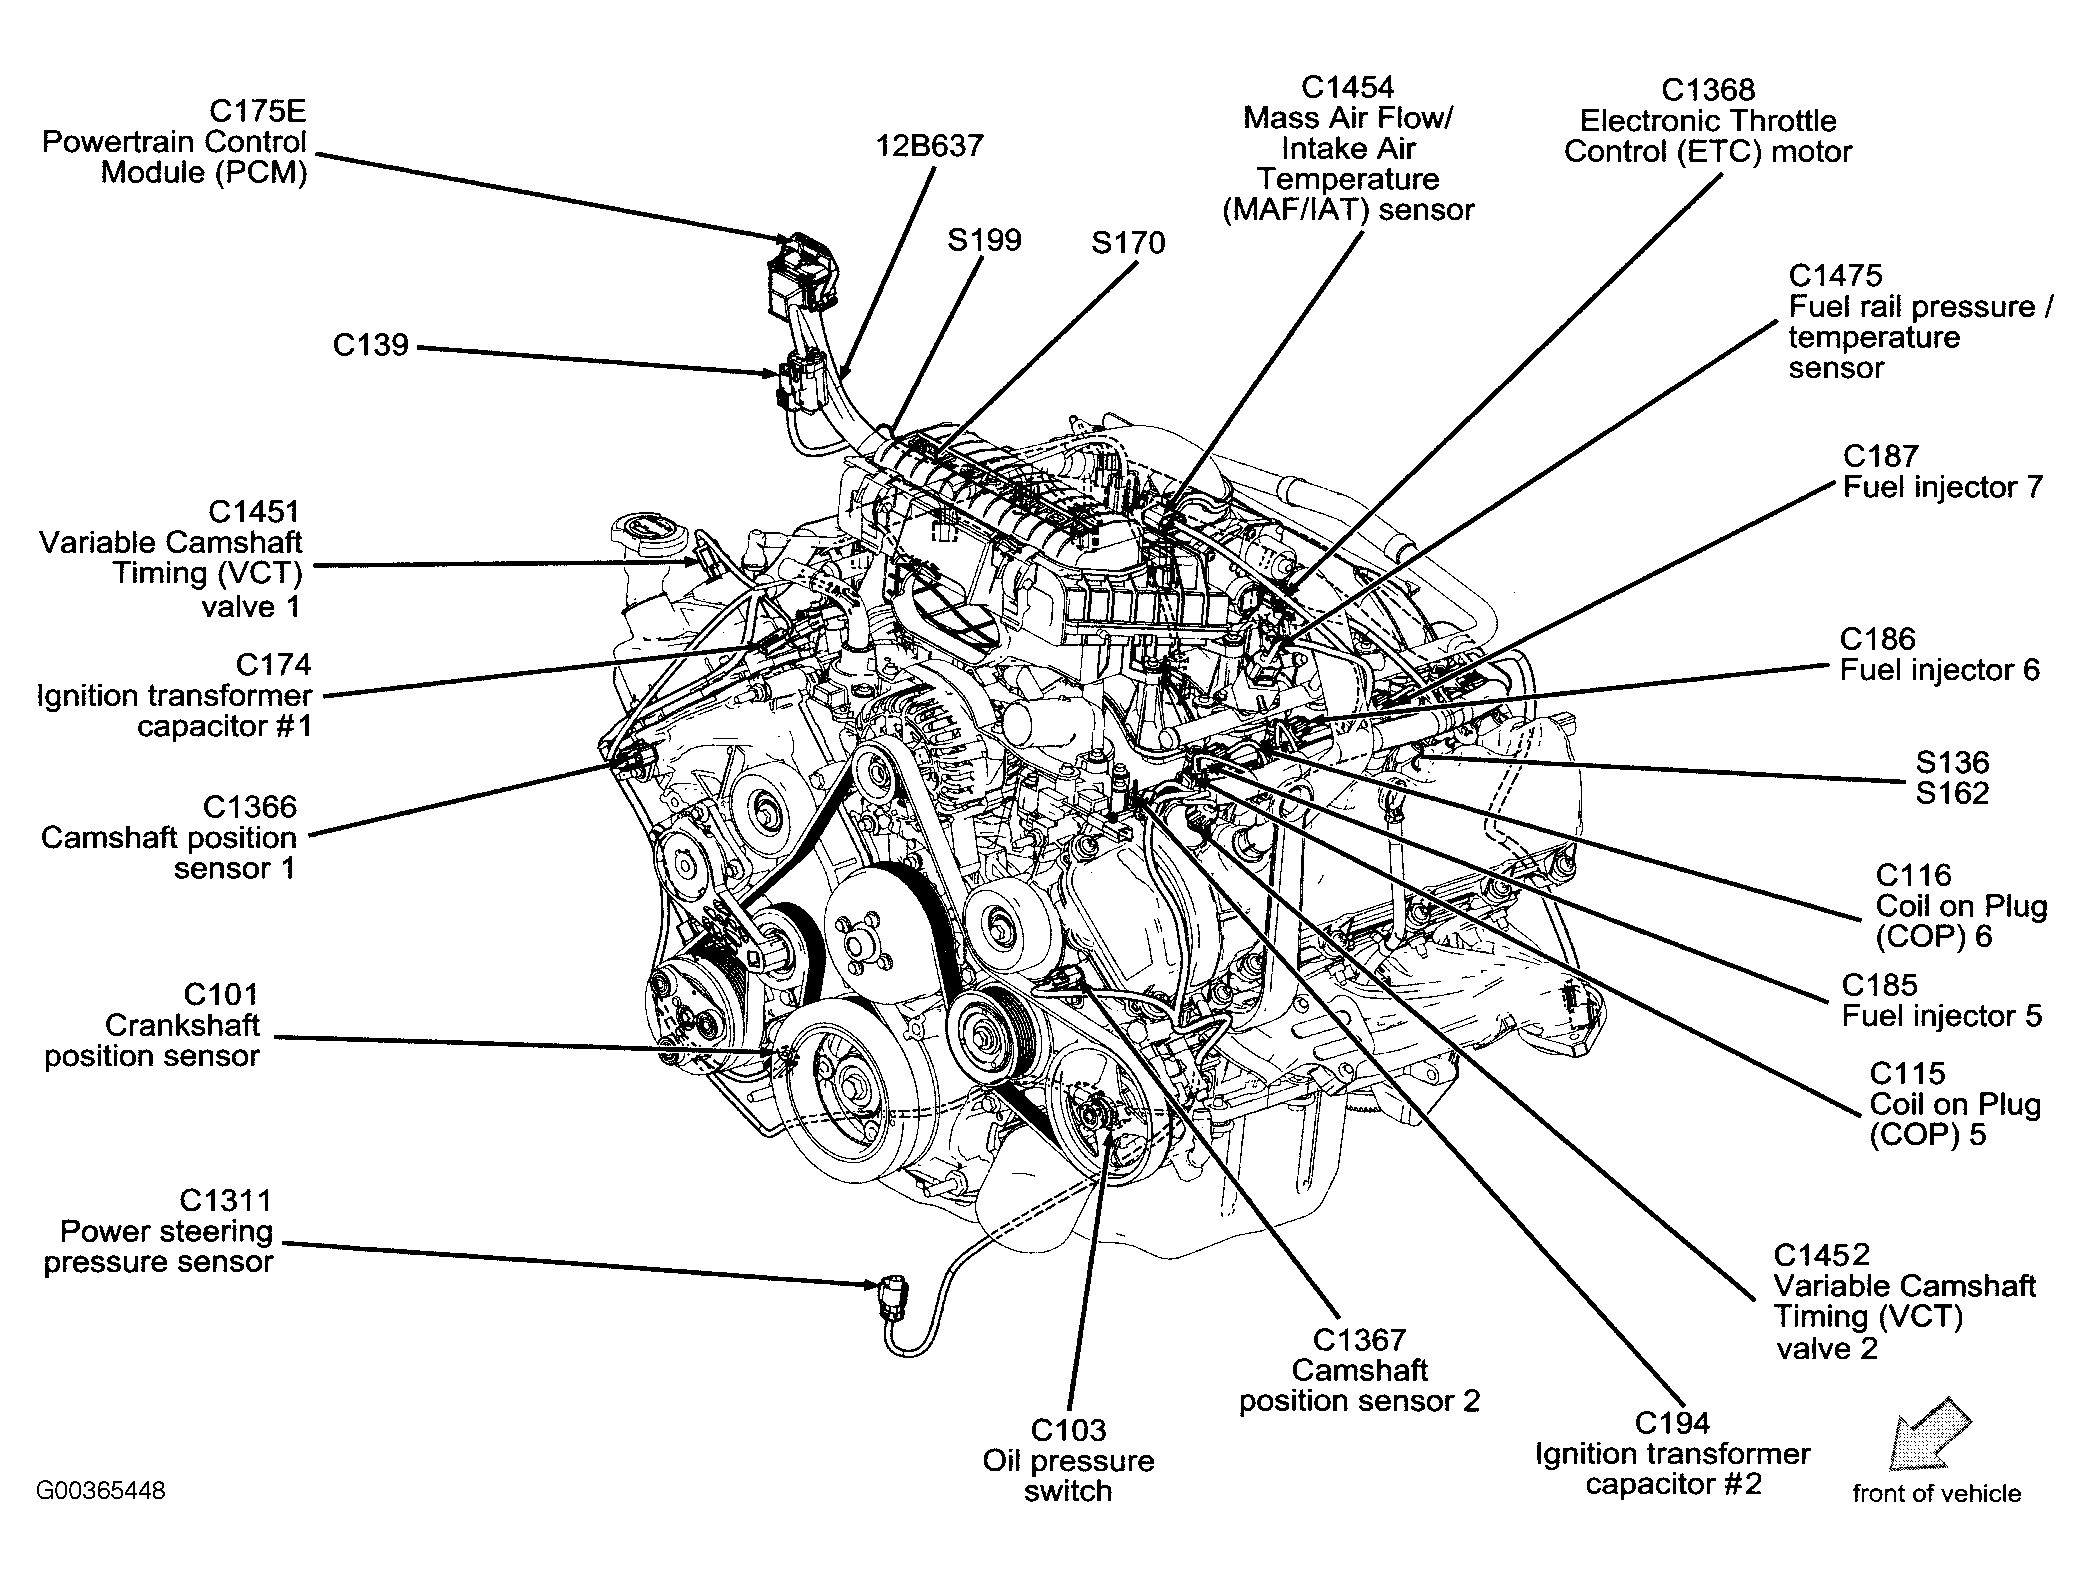 2002 Ford Taurus Engine Diagram - Diagram Schematic Ideas  Taurus Abs Wiring Diagram on